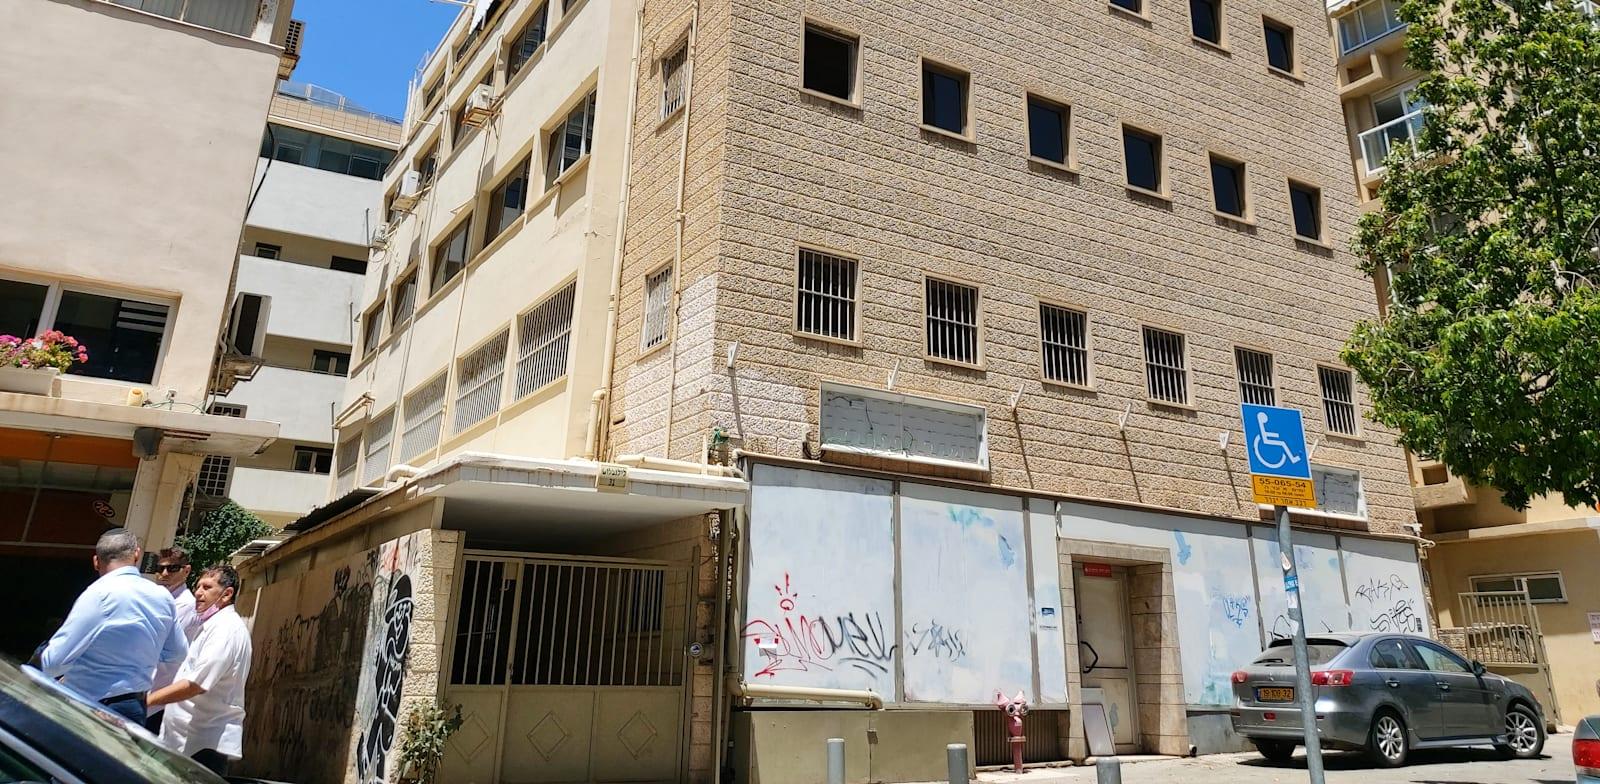 31 Lillienblum Street Photo: Eyal Izhar